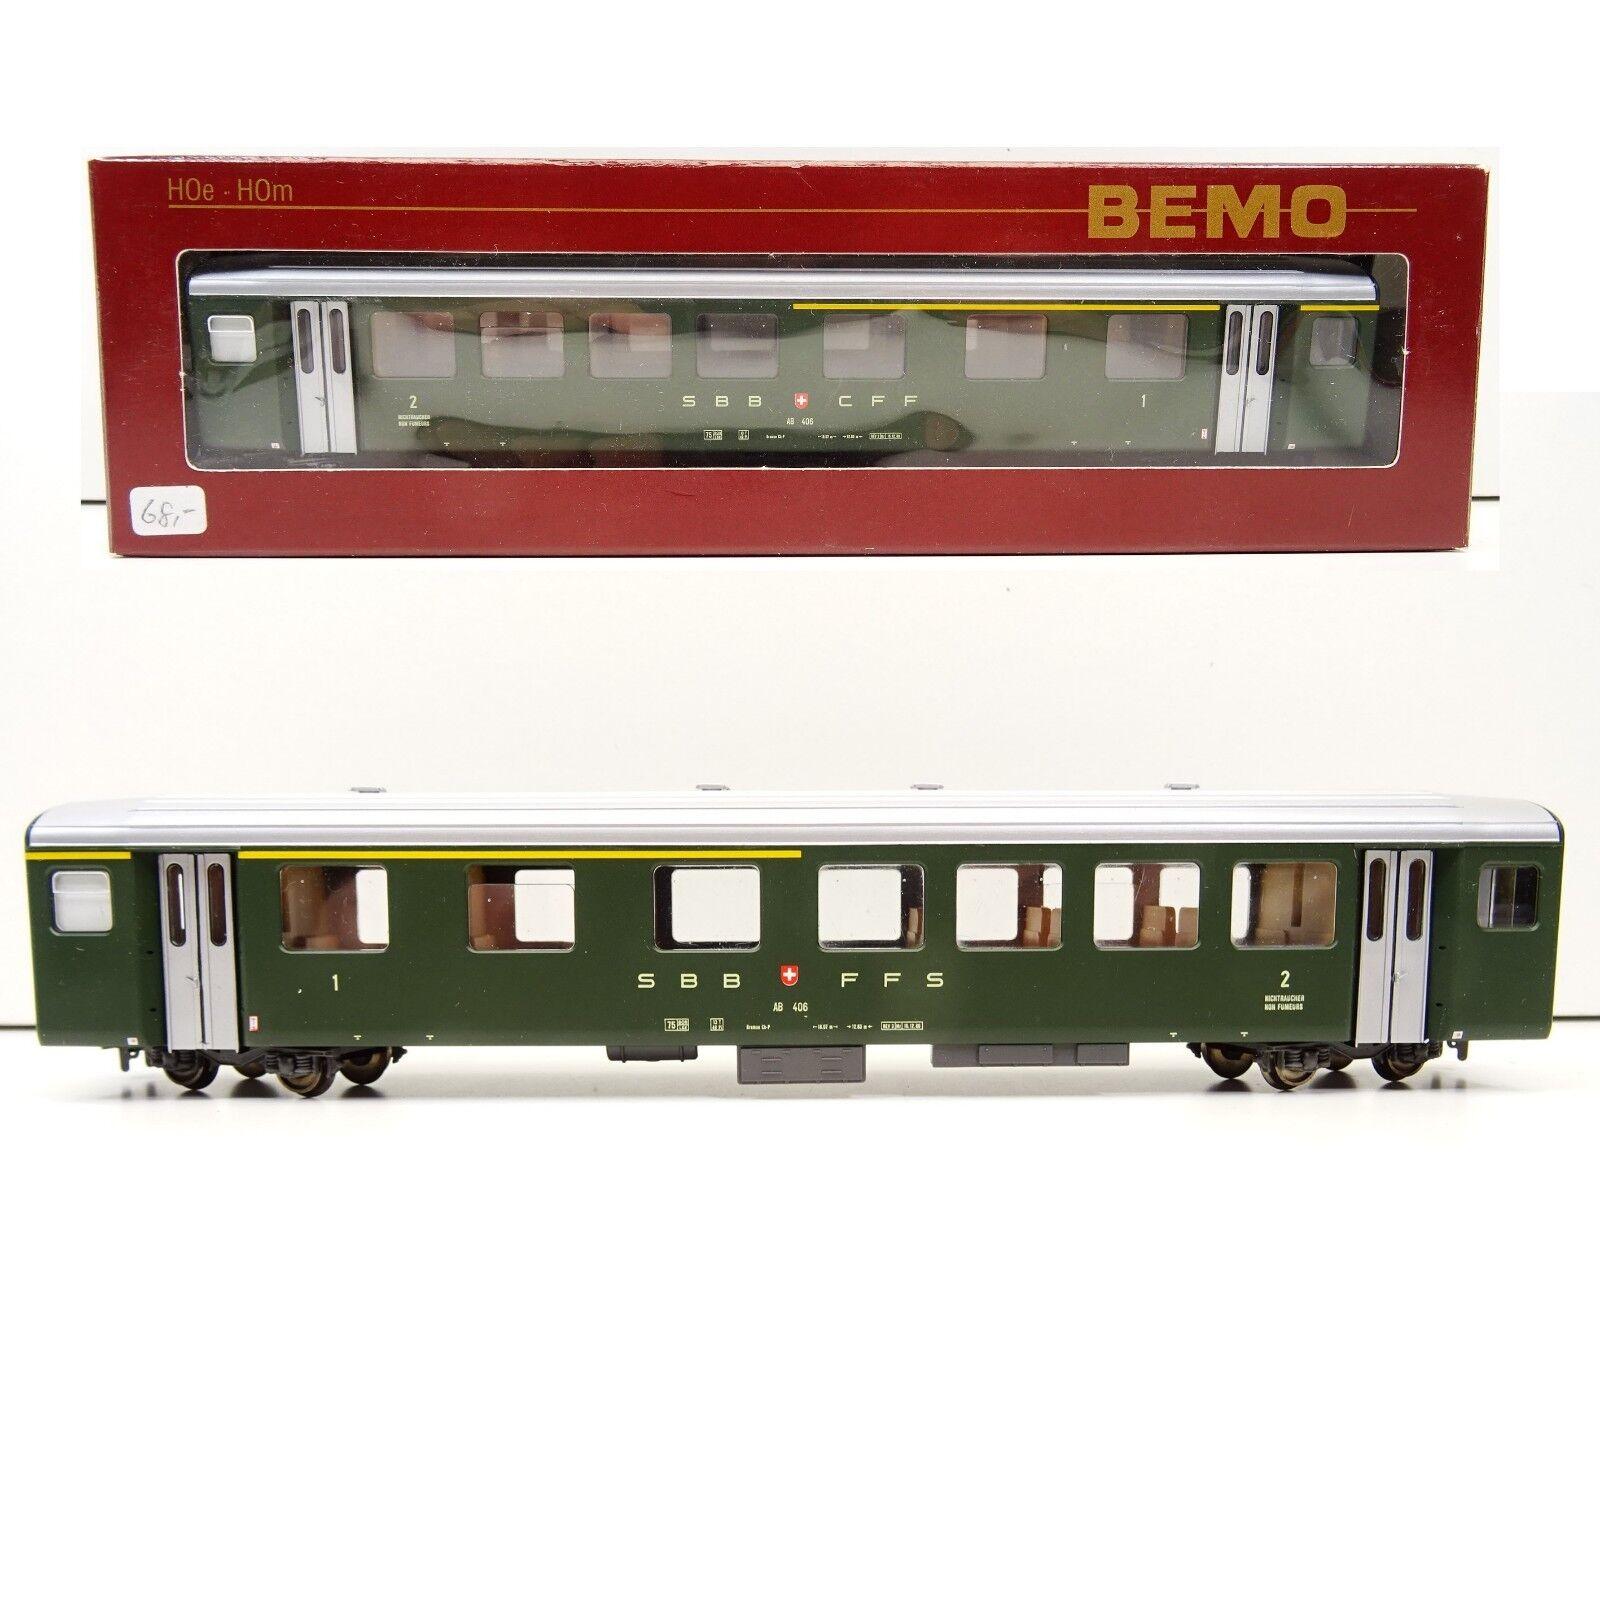 BEMO h0m carreggiata stretta 3277 416 vetture passeggeri SBB 1. 2. CLASSE TOP Scatola Originale c3512